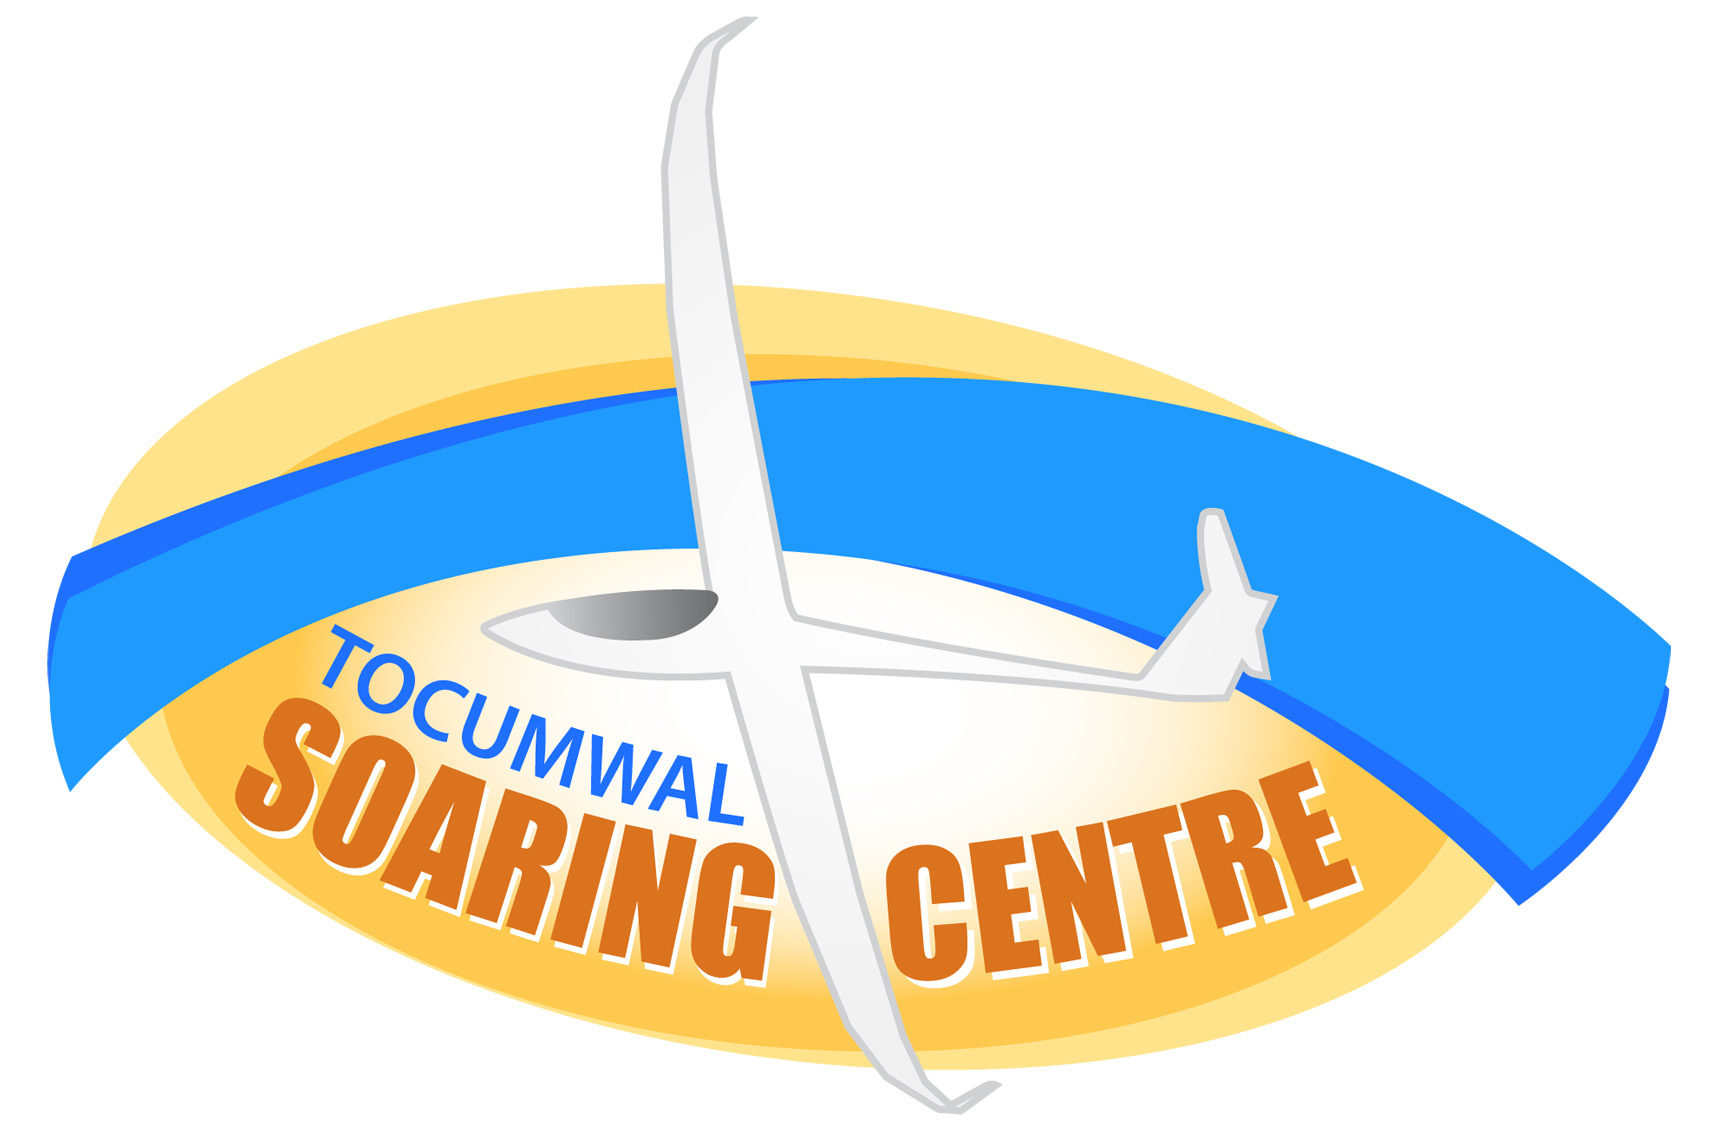 Tocumwal Soaring Centre